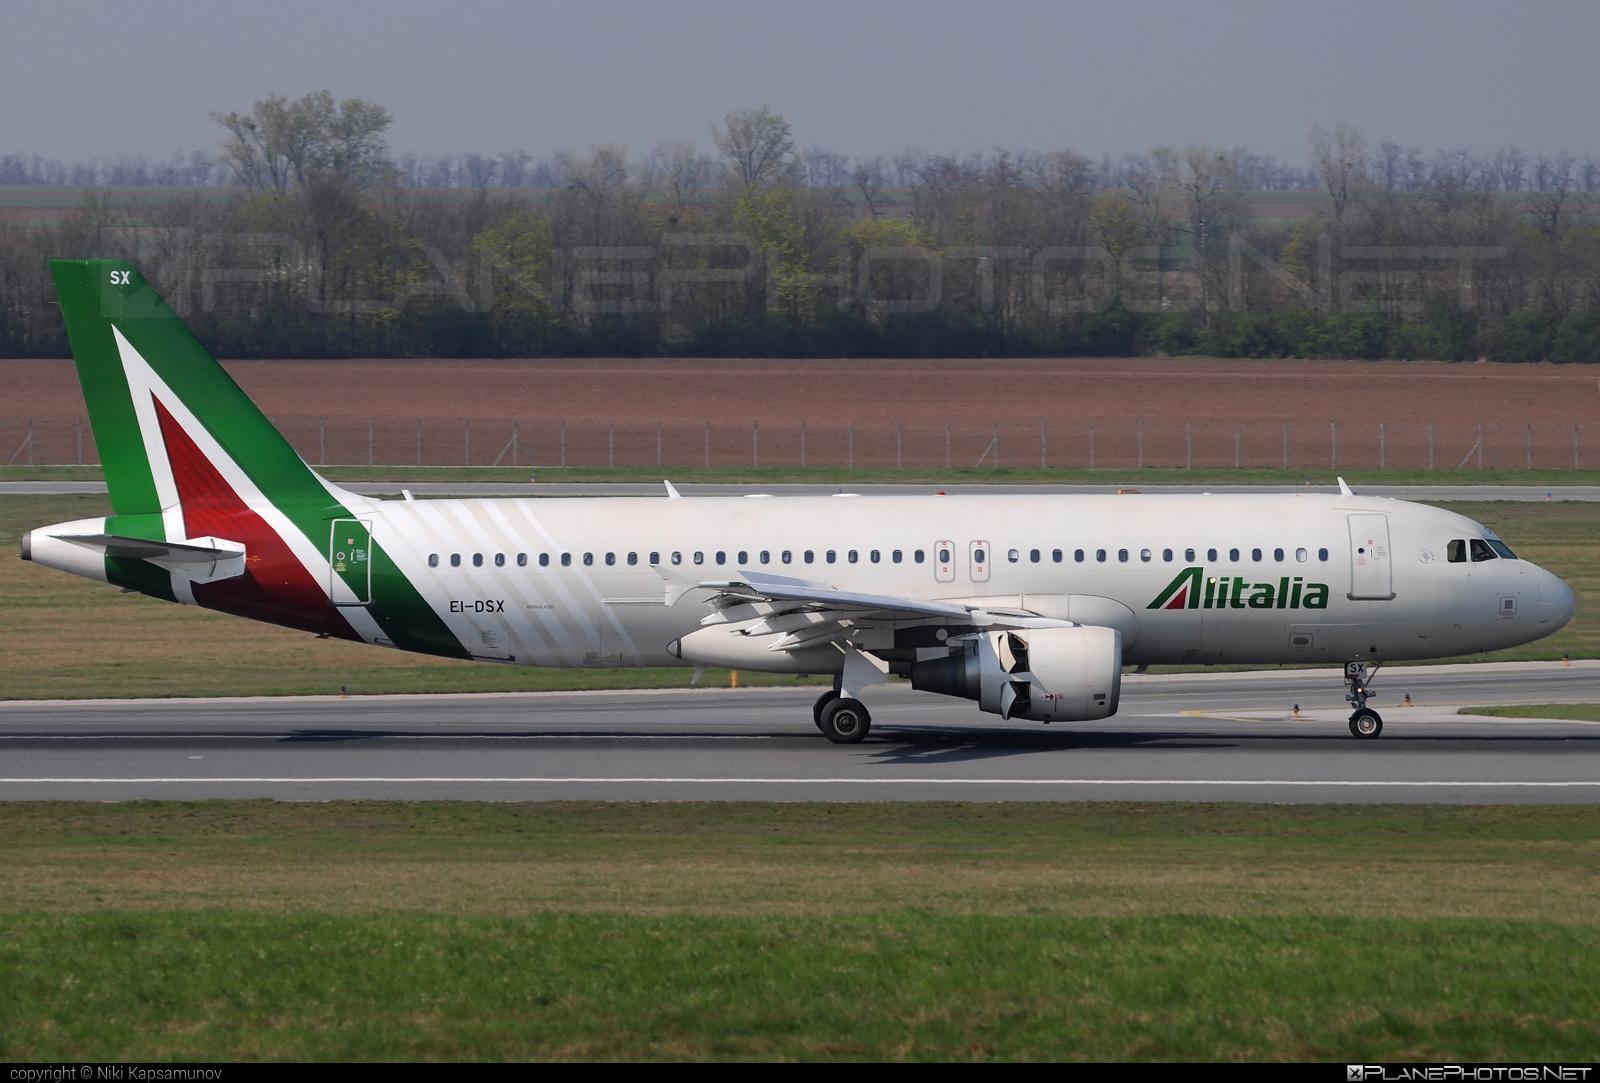 Airbus A320-216 - EI-DSX operated by Alitalia #a320 #a320family #airbus #airbus320 #alitalia